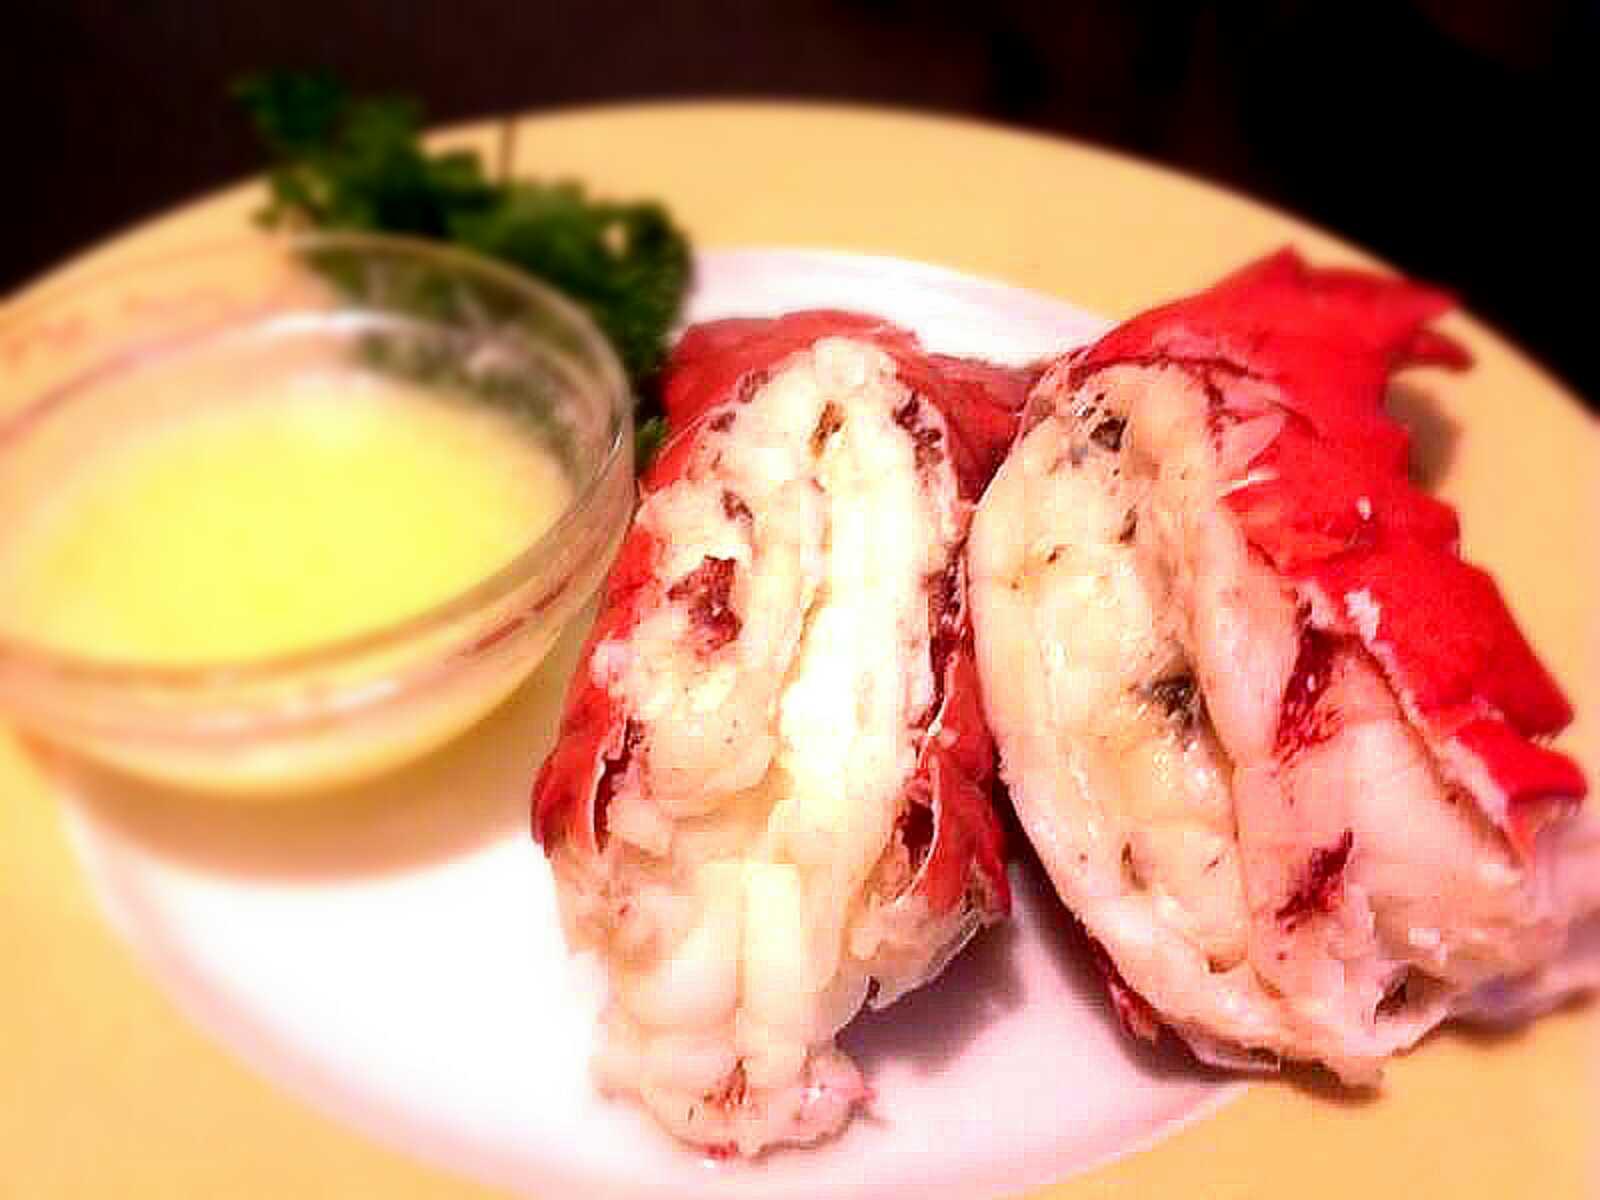 Food Network Steamed Lobster Tails